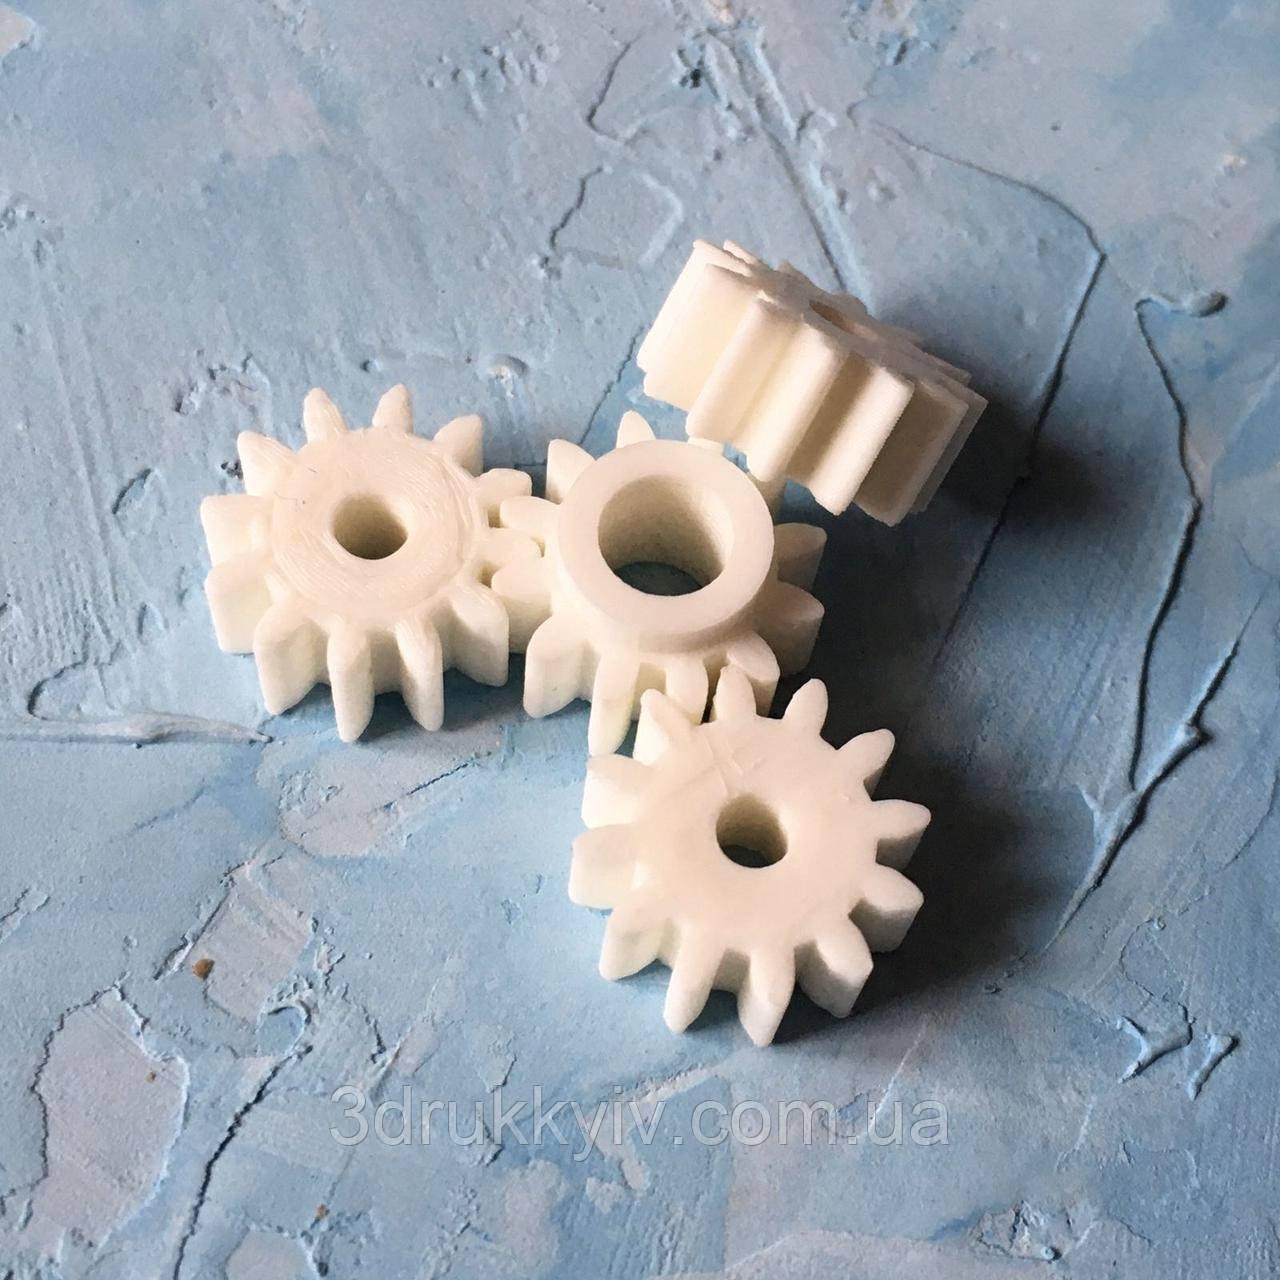 Шестерни для редуктора блендера 4 шт. / Шестерні редуктора блендера Philips 4 шт. та ін.